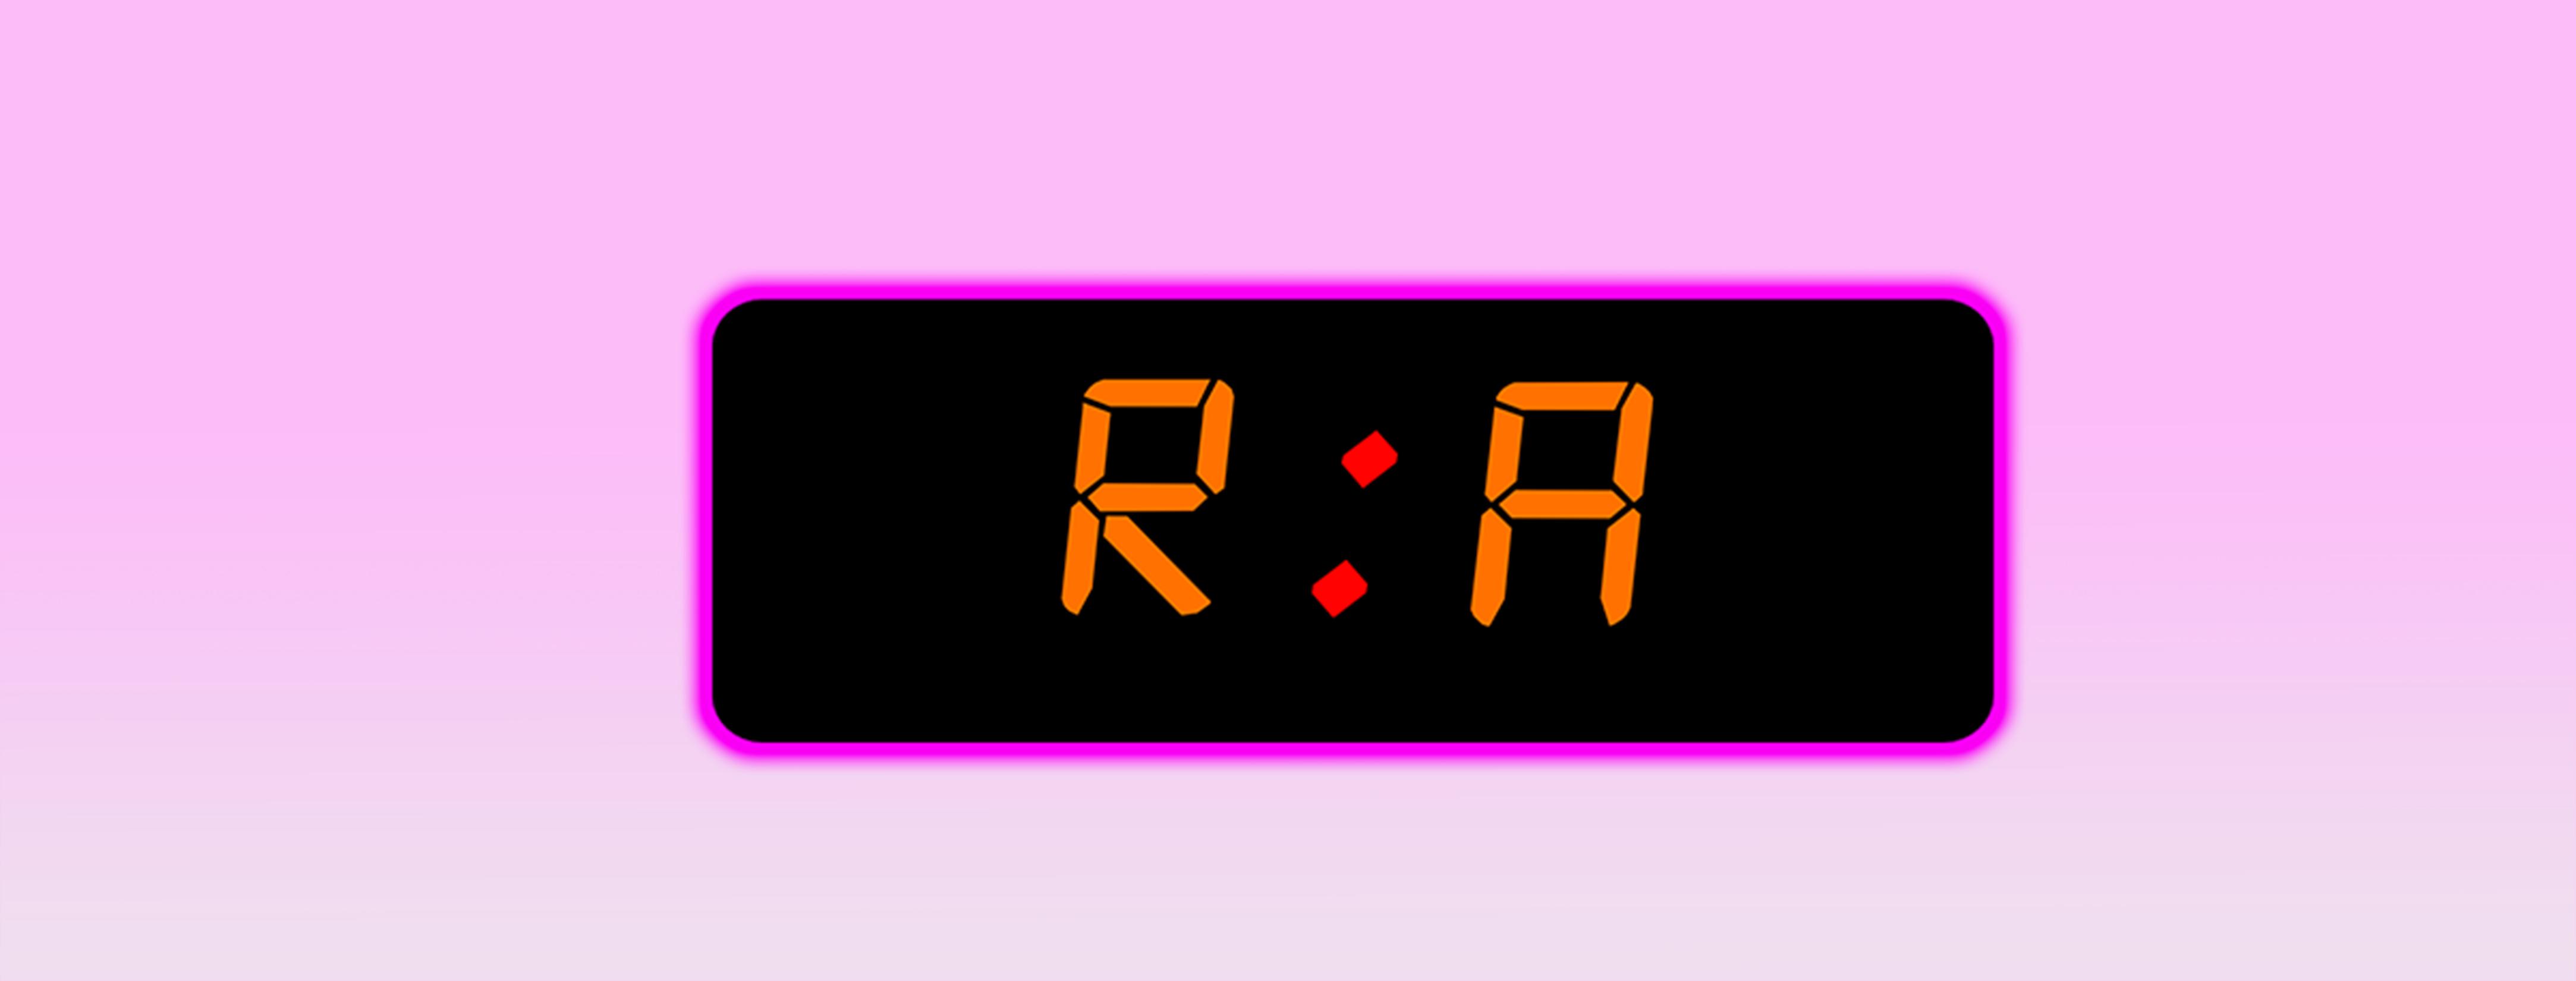 Radio Alarm_KHM